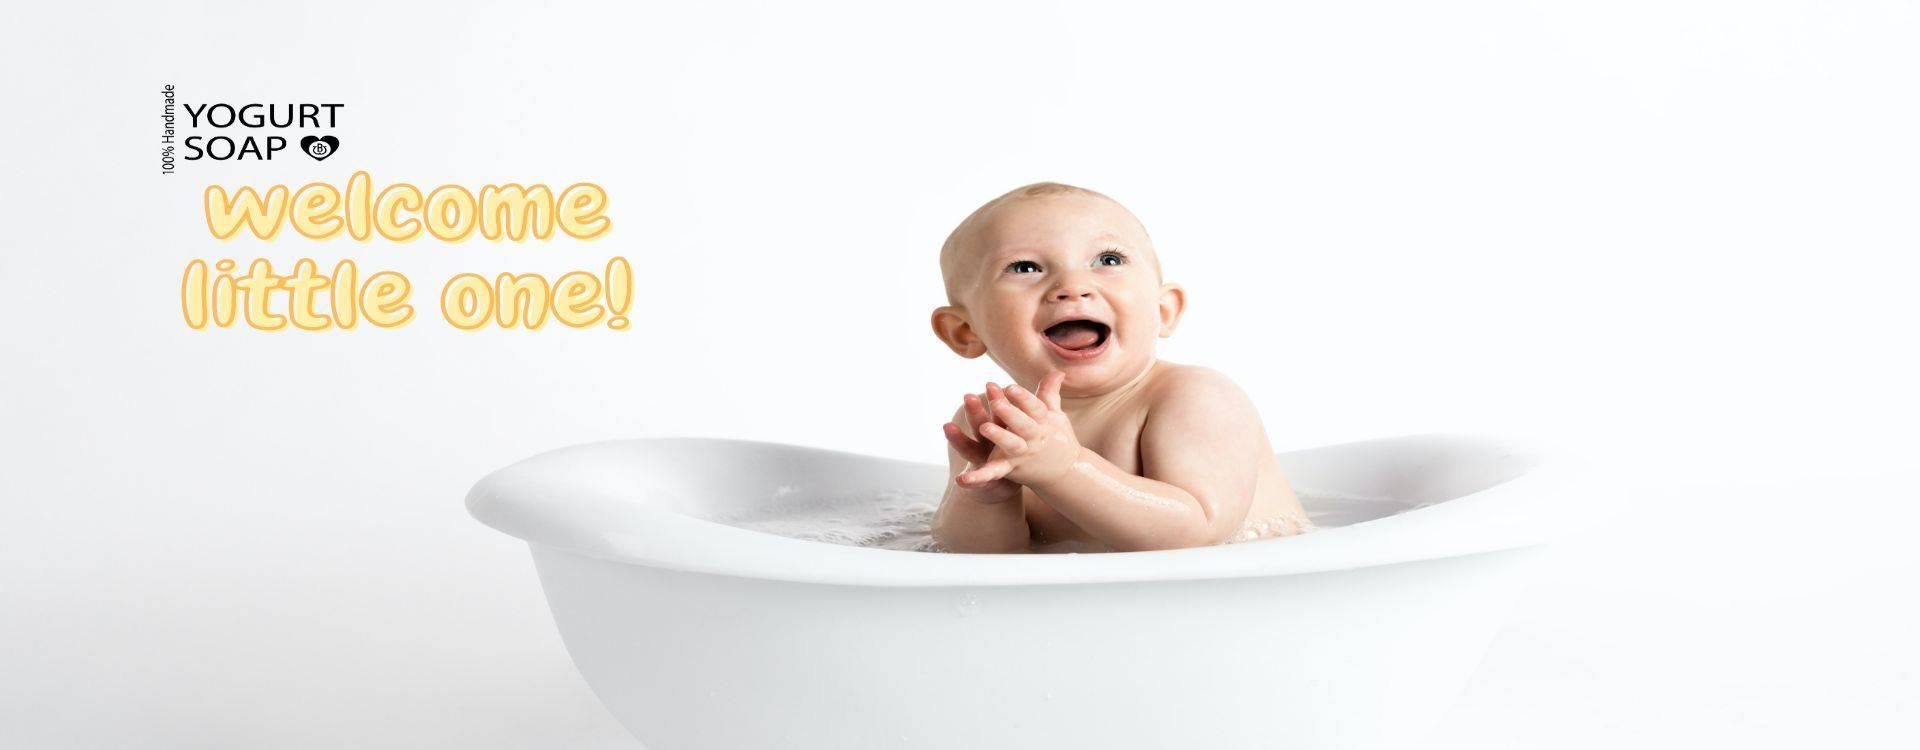 NBJ Soap (Baby bathtub)